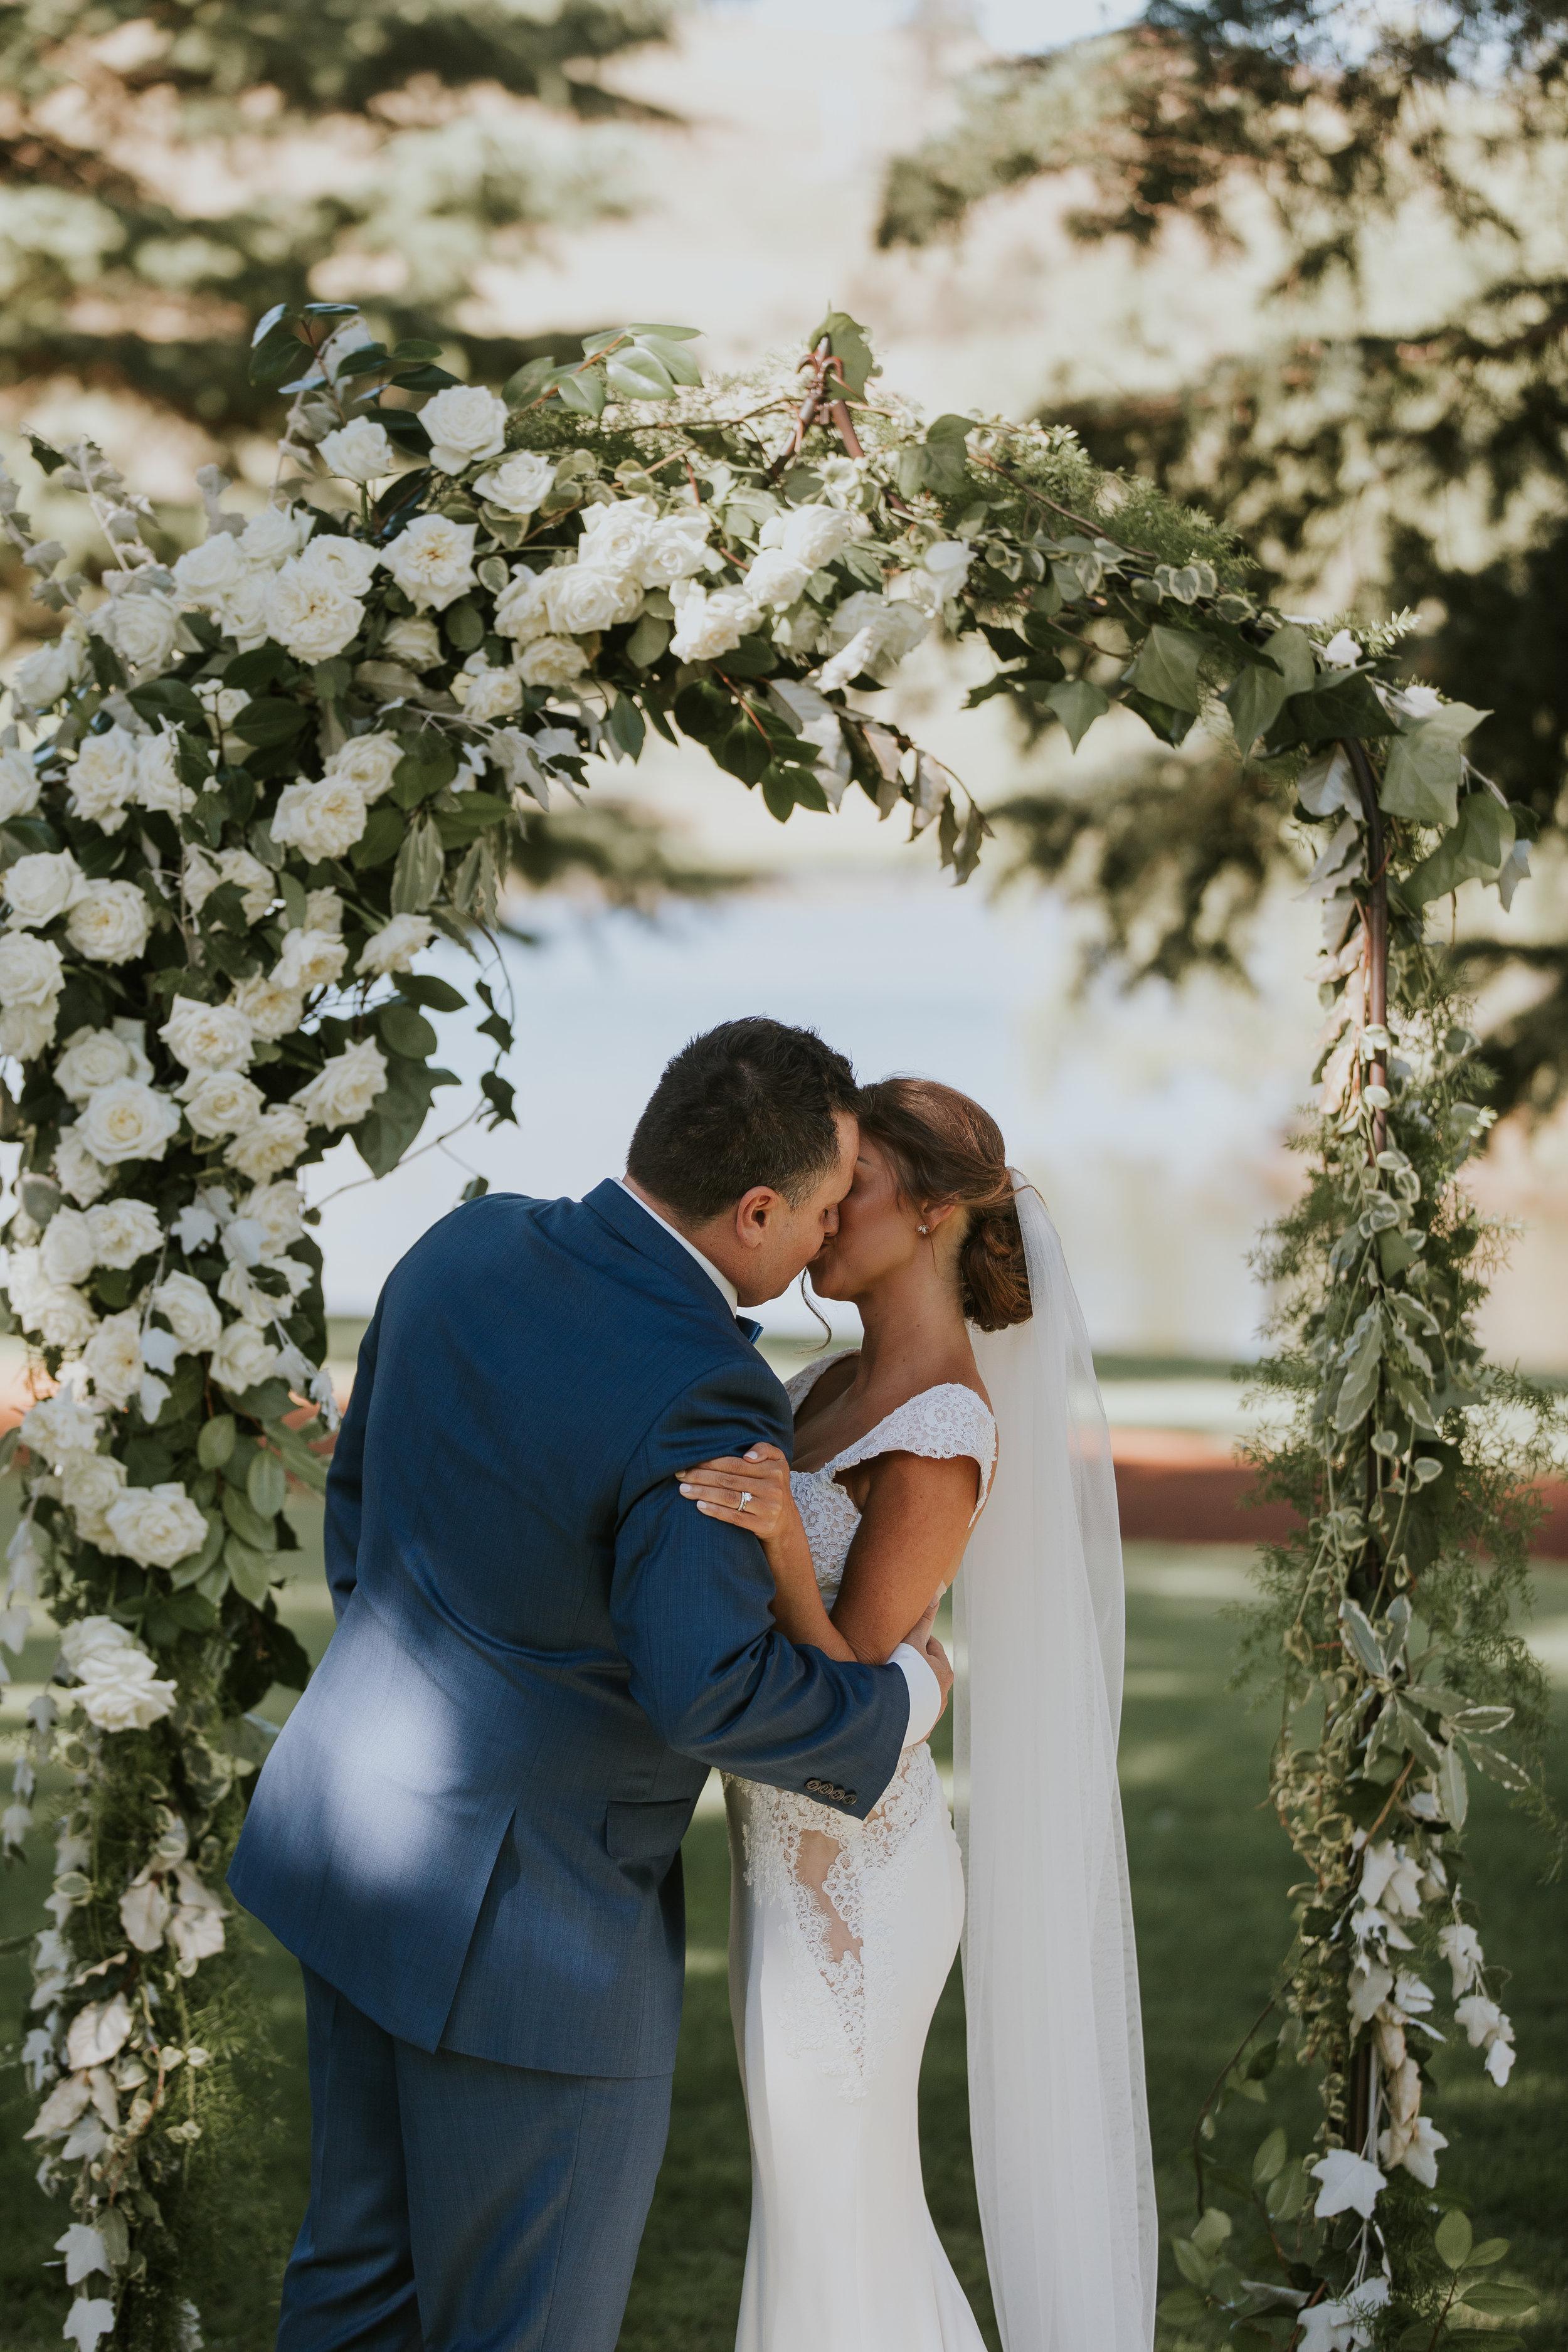 keli-luke-maybury-wedding-189.jpg